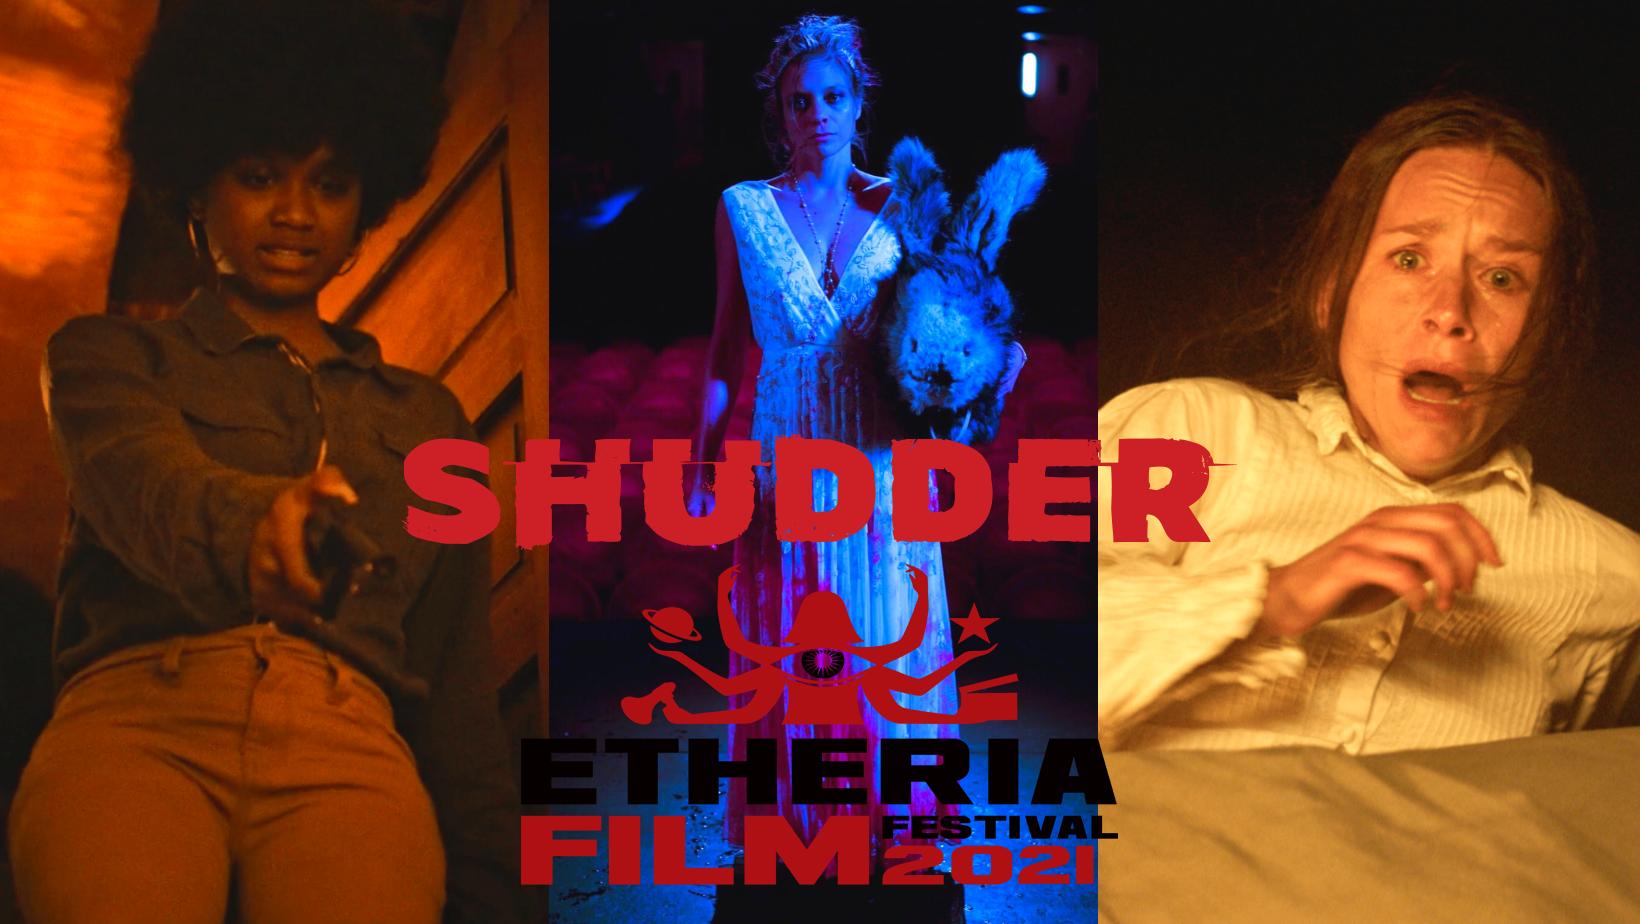 Etheria Film Festival 2021 Cover Photo